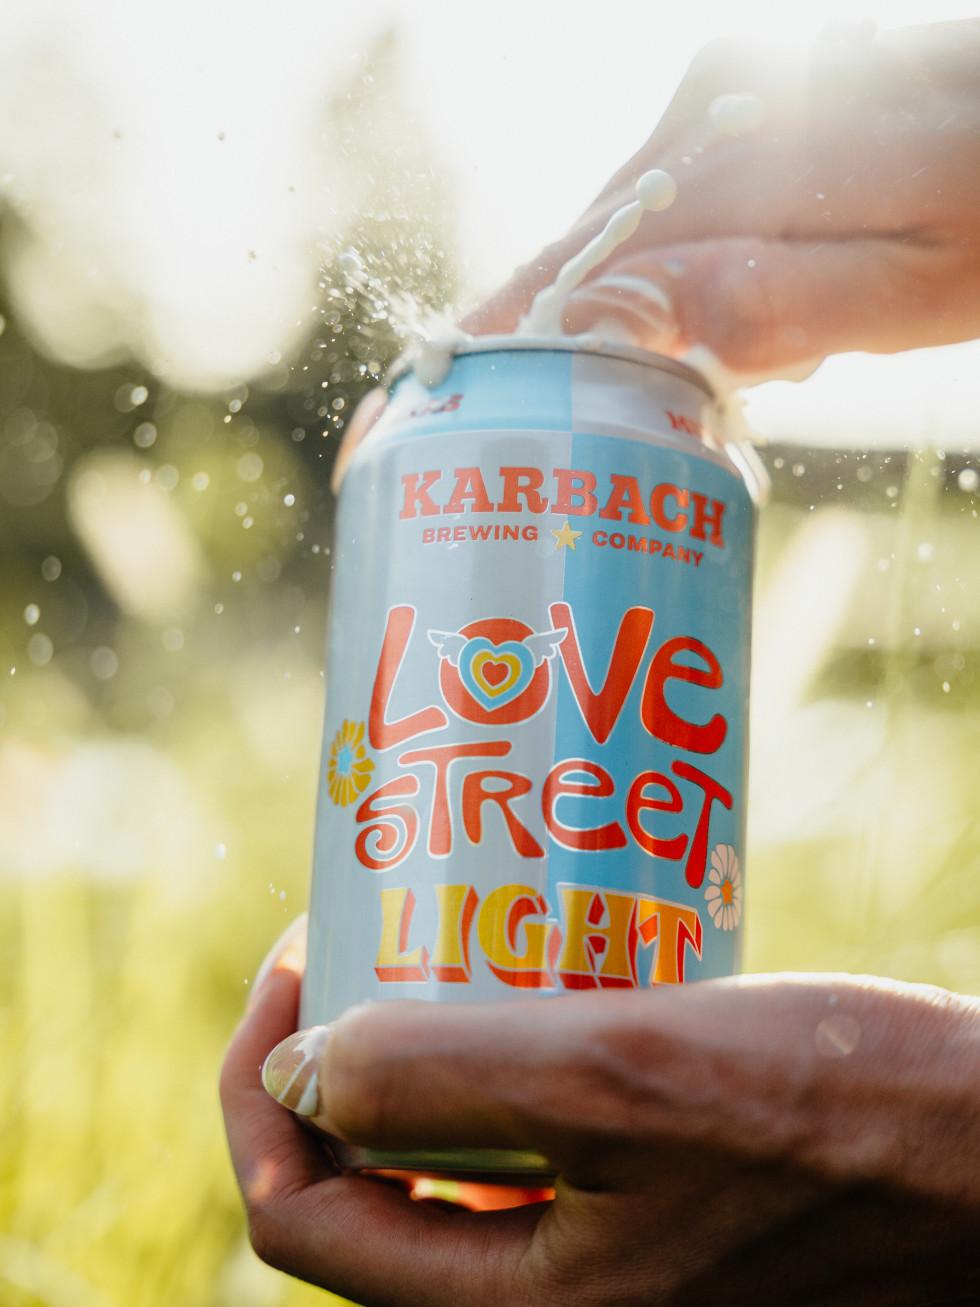 Love Street Light beer